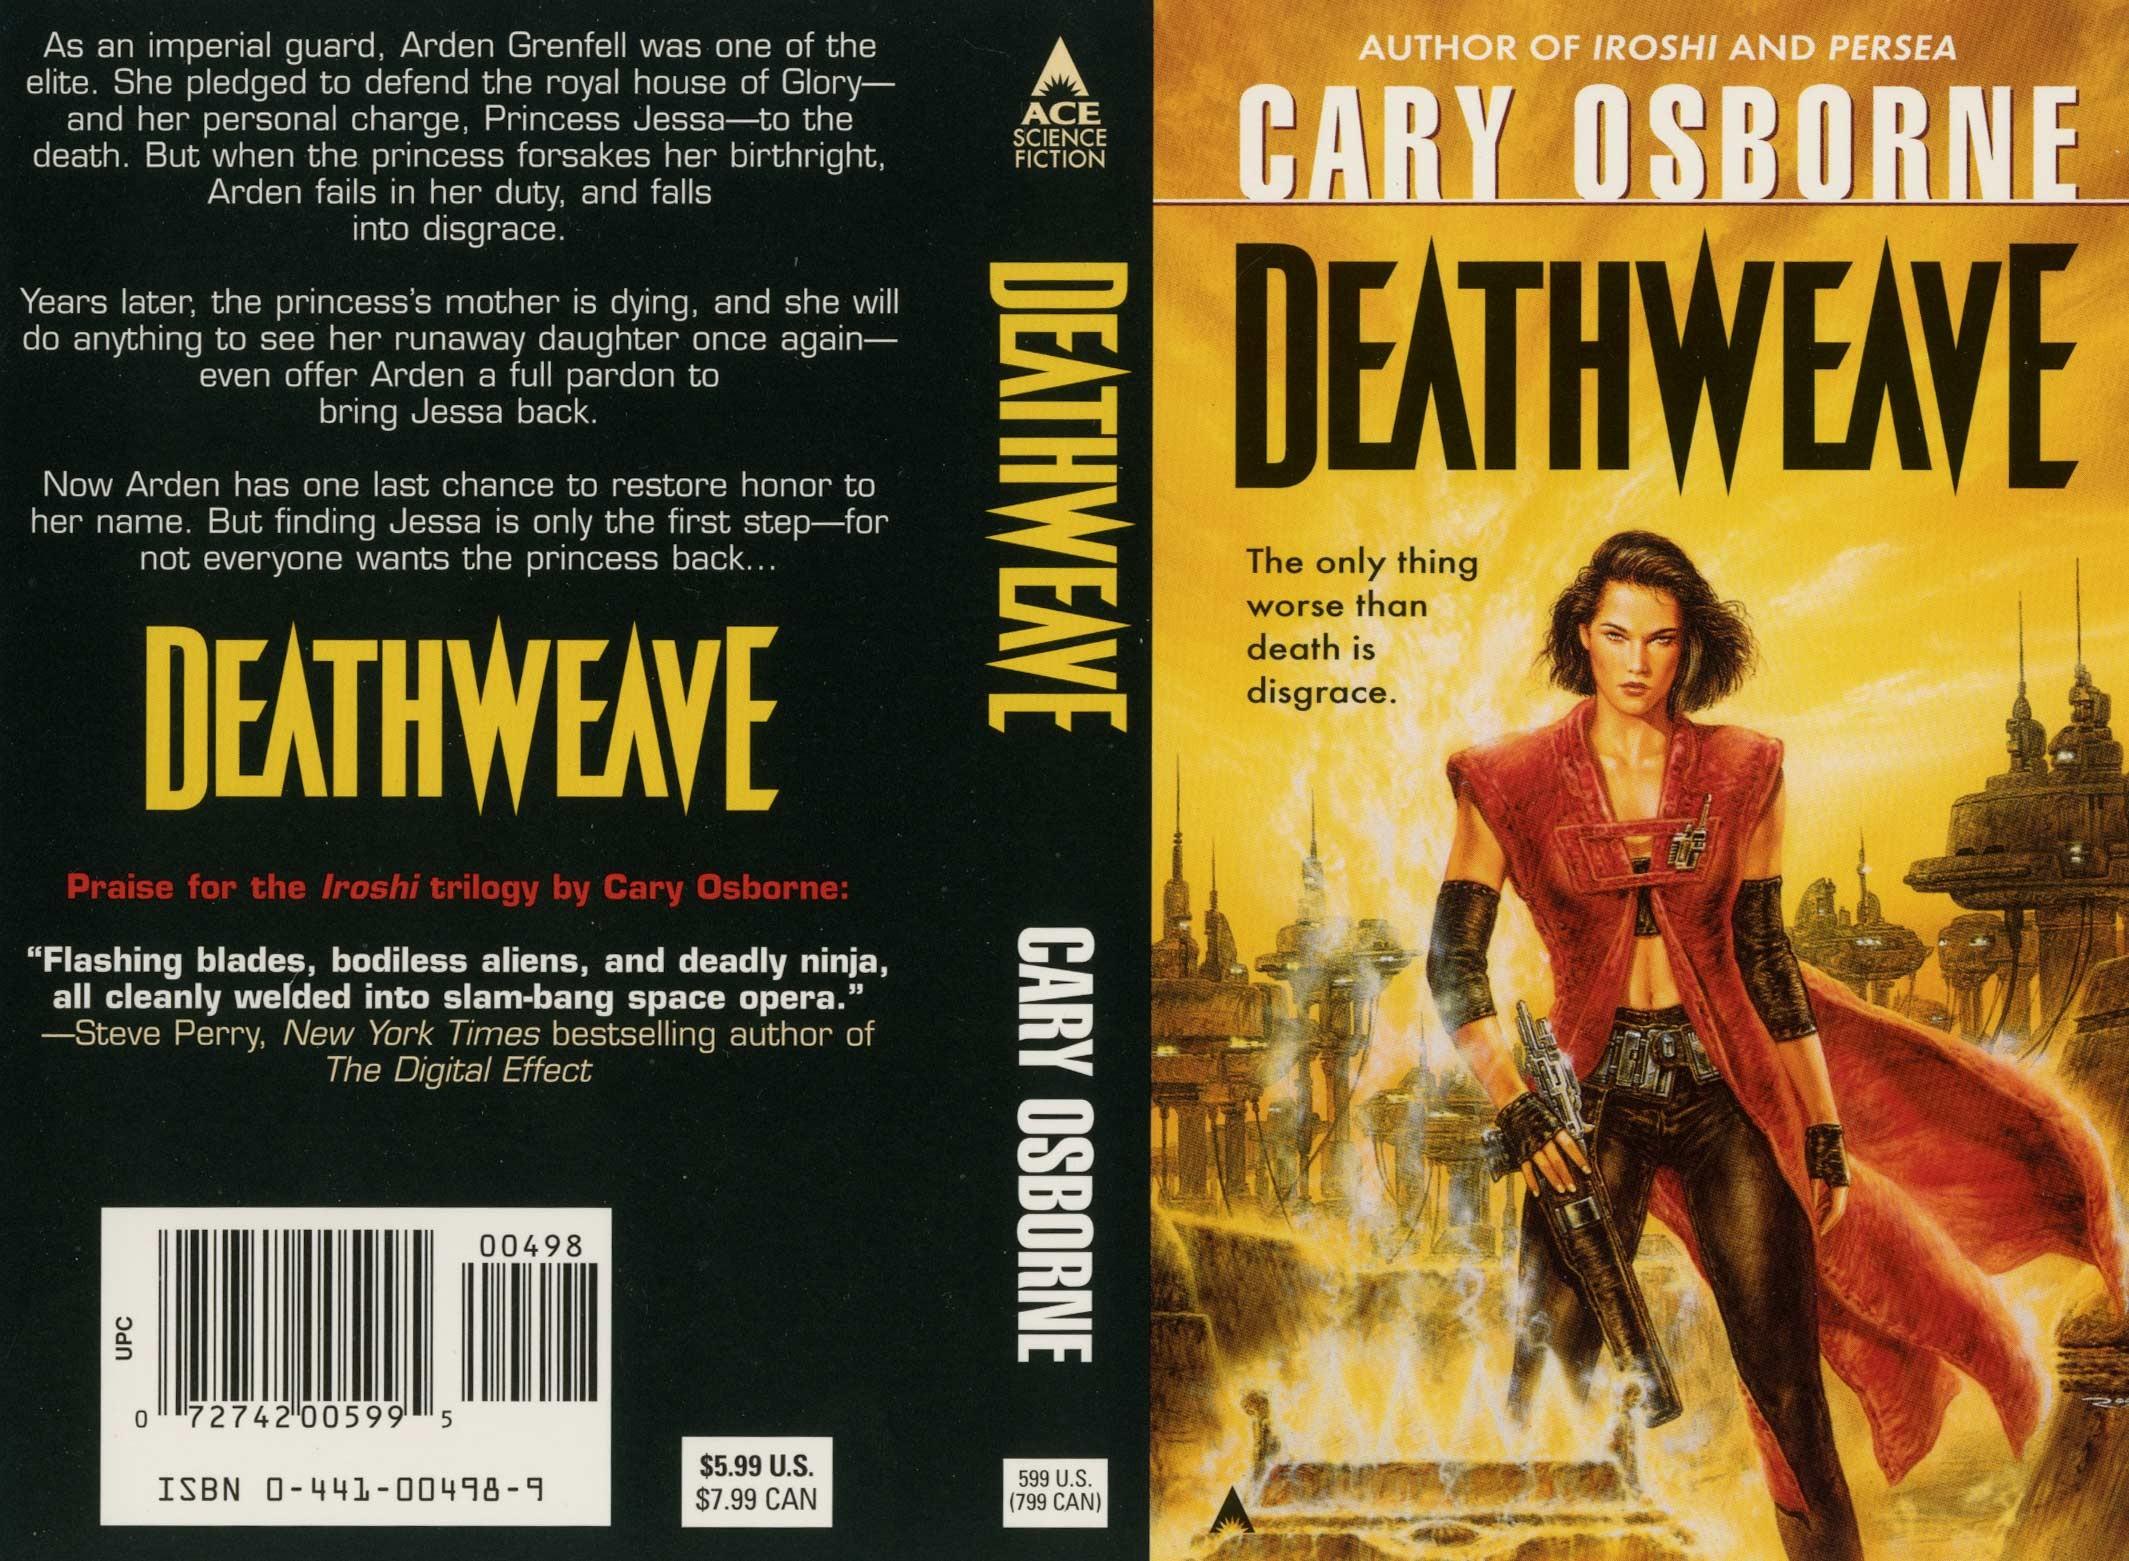 DEATHWEAVE